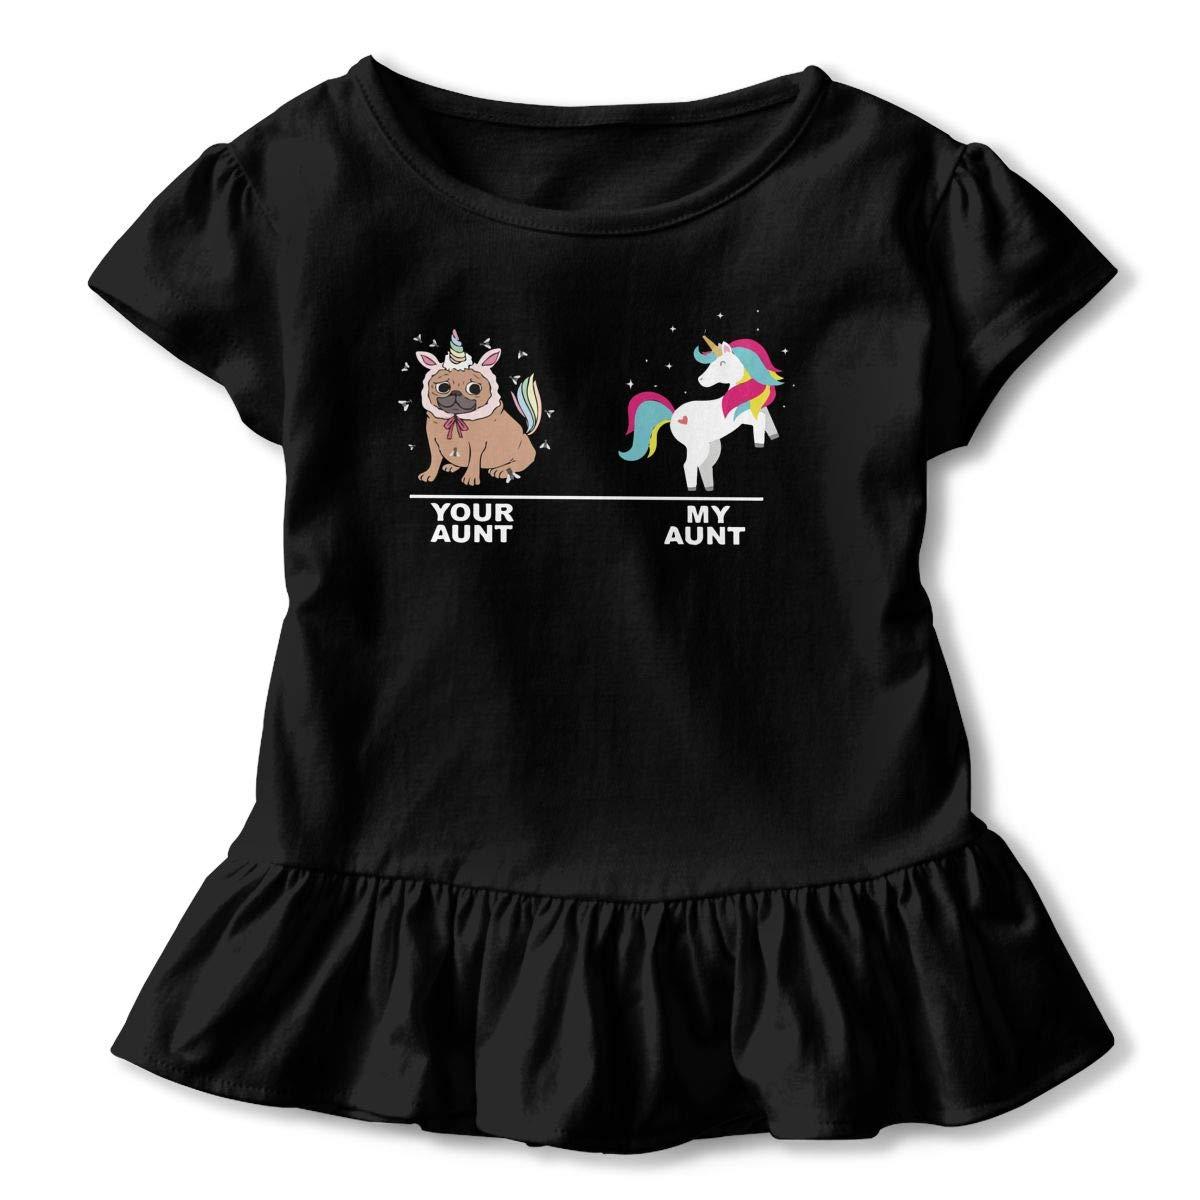 Unicorn Your Aunt My Aunt Funny Toddler Baby Girls Short Sleeve Ruffle T-Shirt